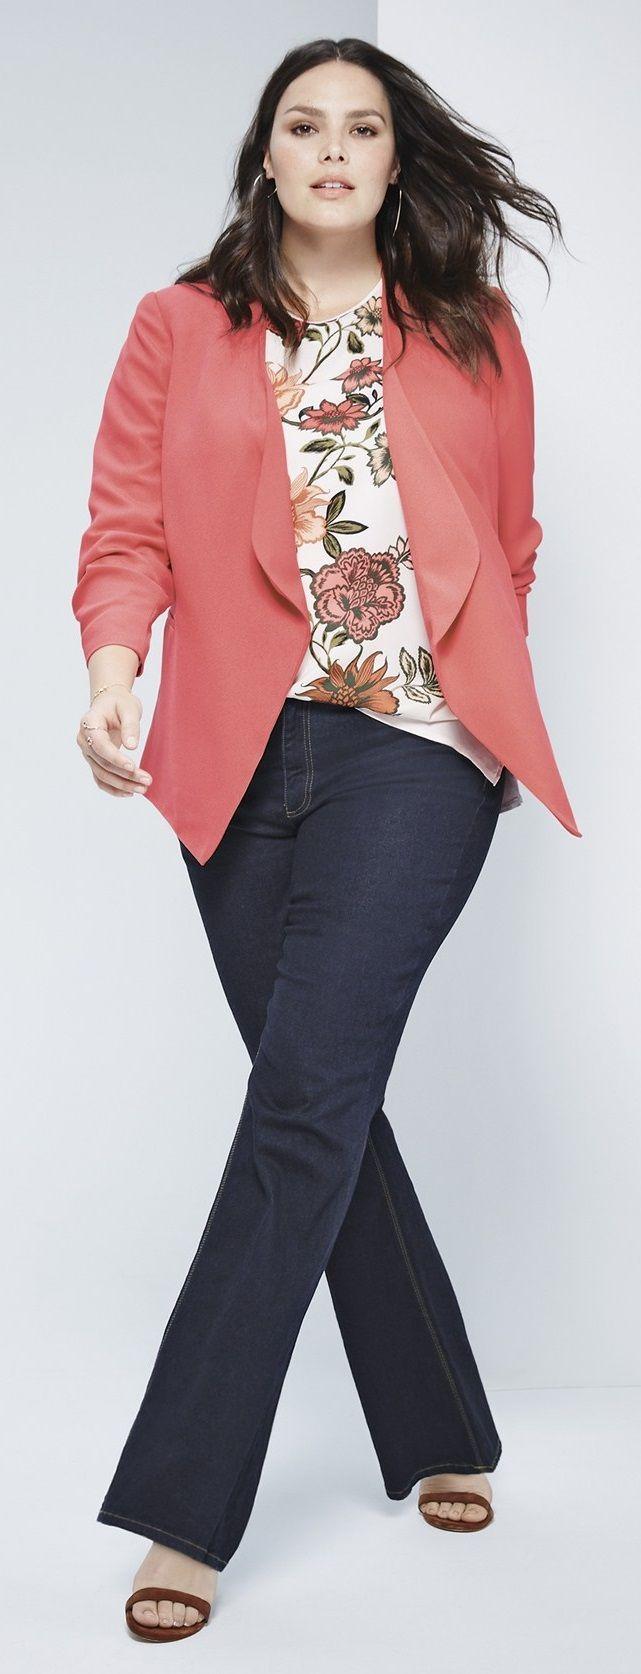 Plus Size Fashion - Plus Size Outfit - Plus Size Drape Front Blazer